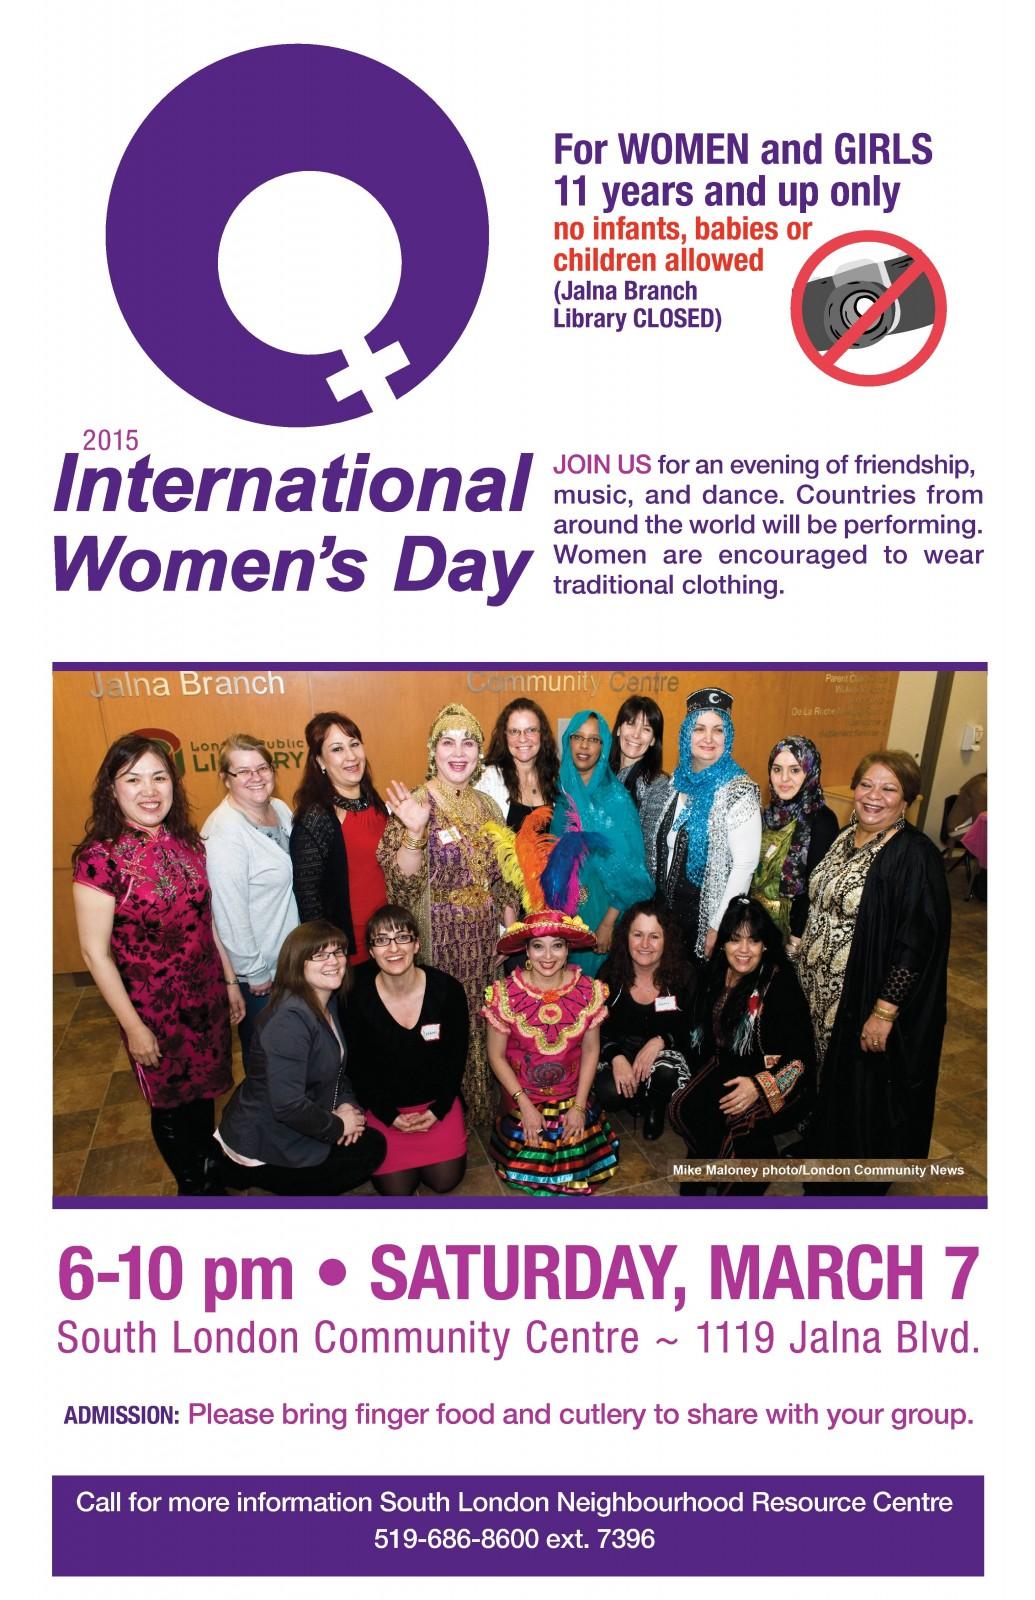 South London Community Centre set to celebrate International Women's Day